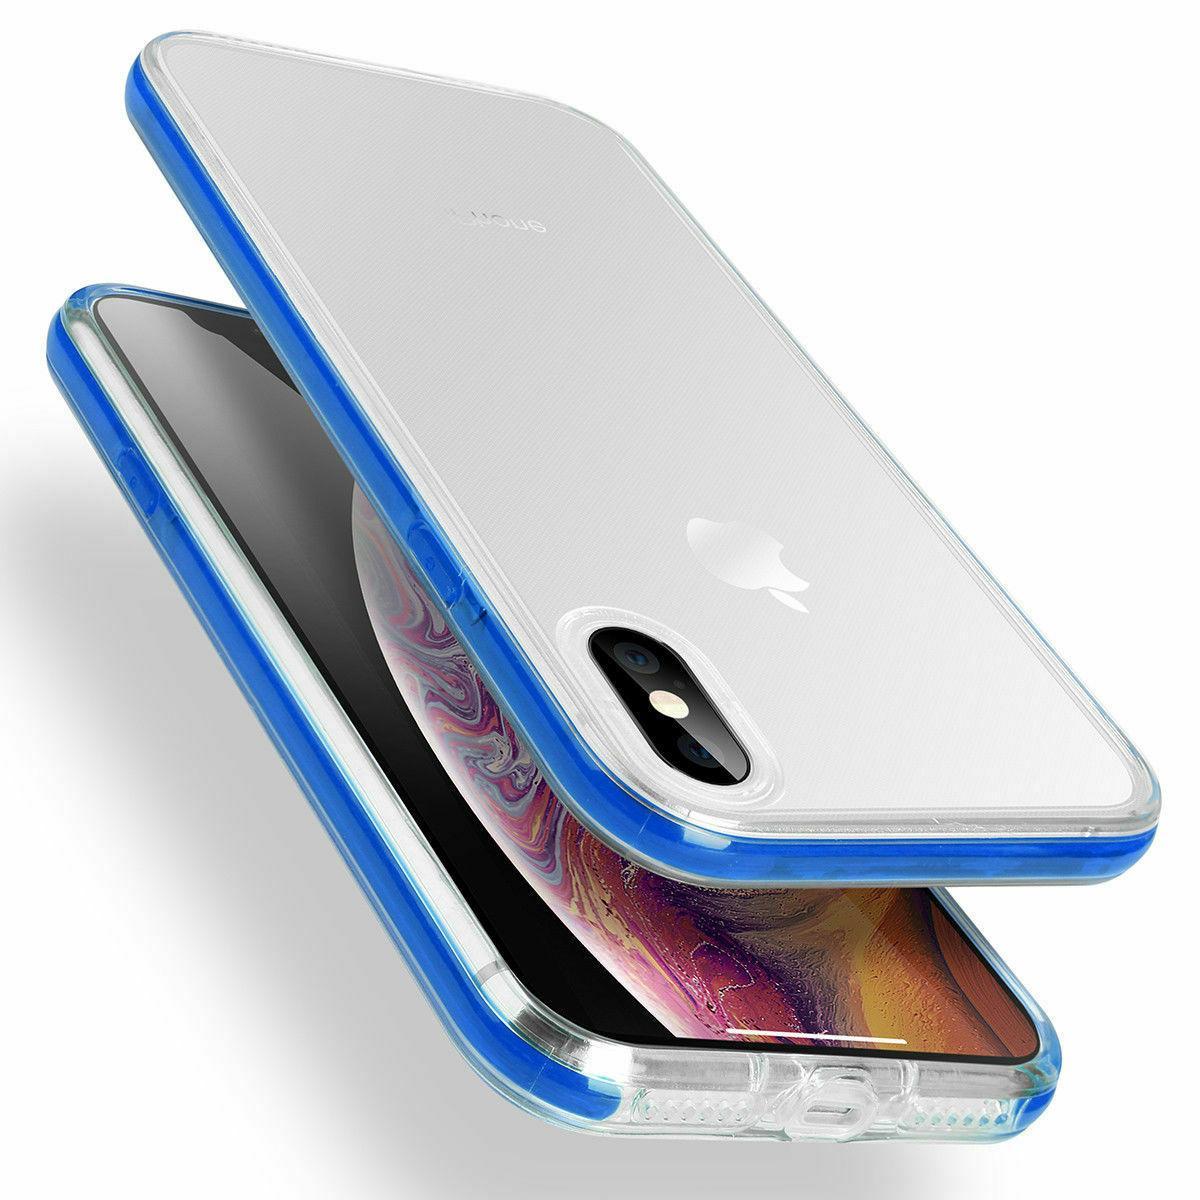 Waterproof DirtProof Case iPhone X Max 6